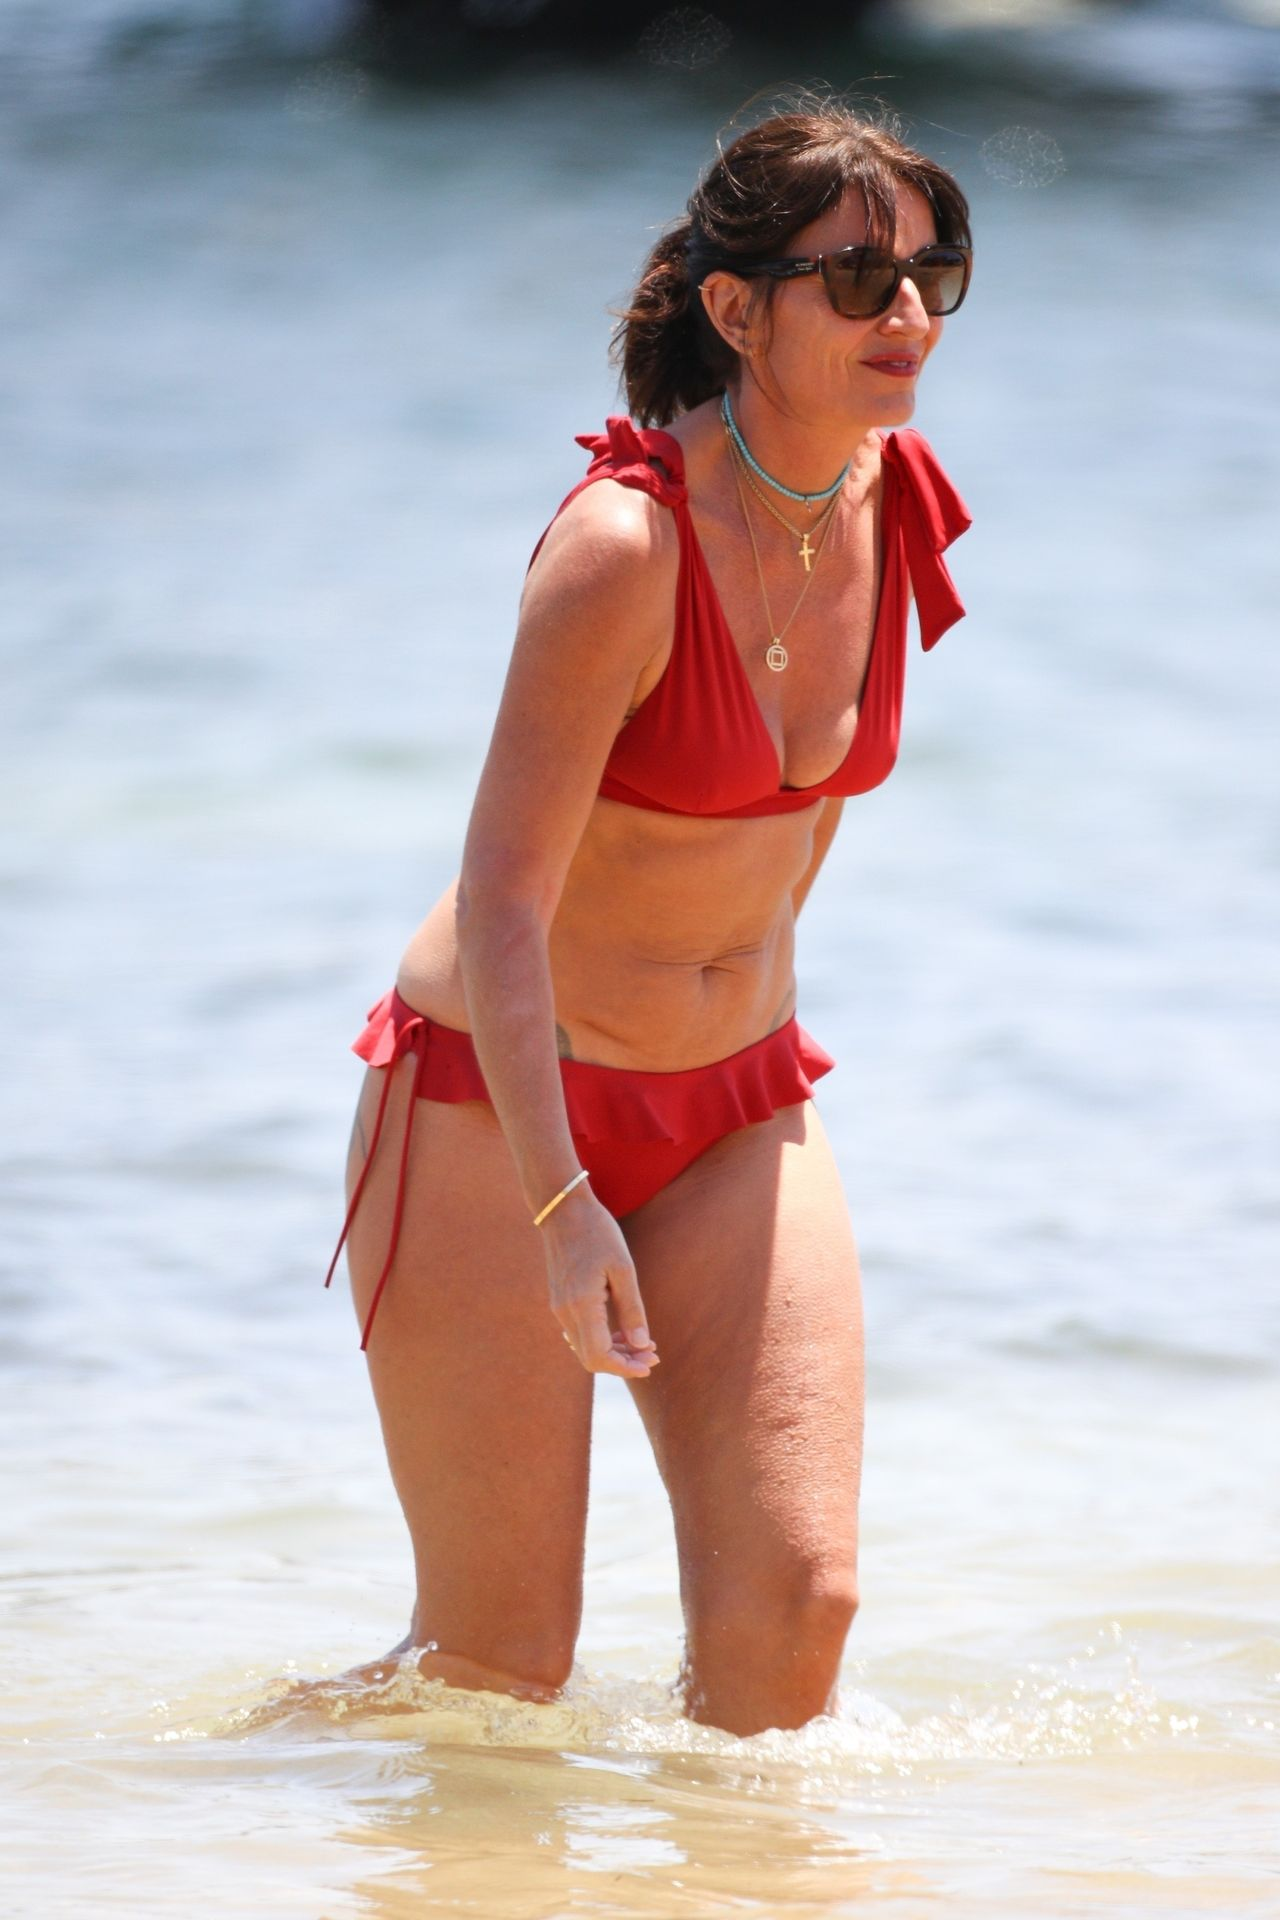 Bikini Davina Mccall Nude Pics Scenes